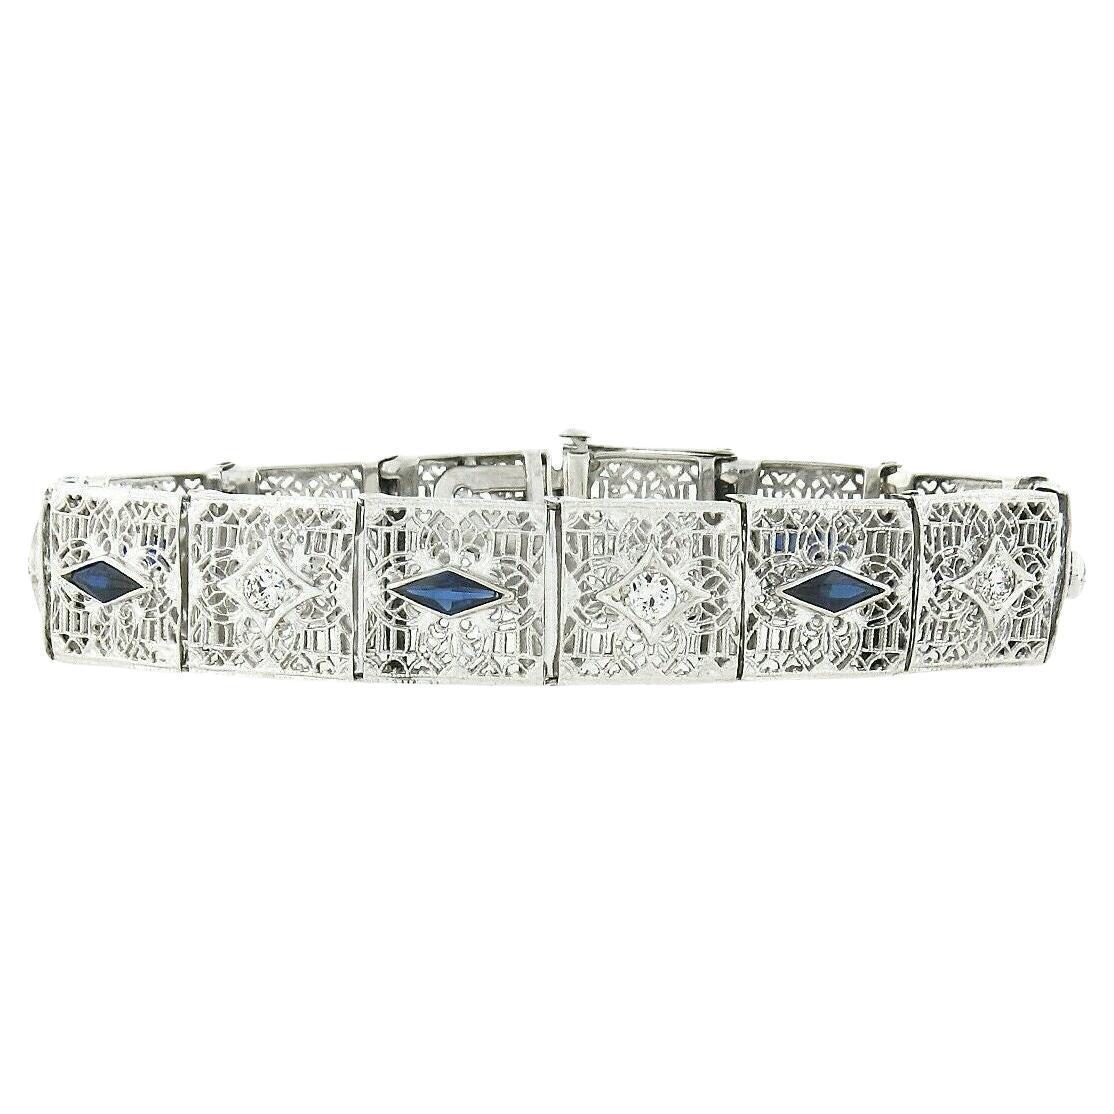 Antique Art Deco 14k White Gold European Diamond Sapphire Wide Filigree Bracelet